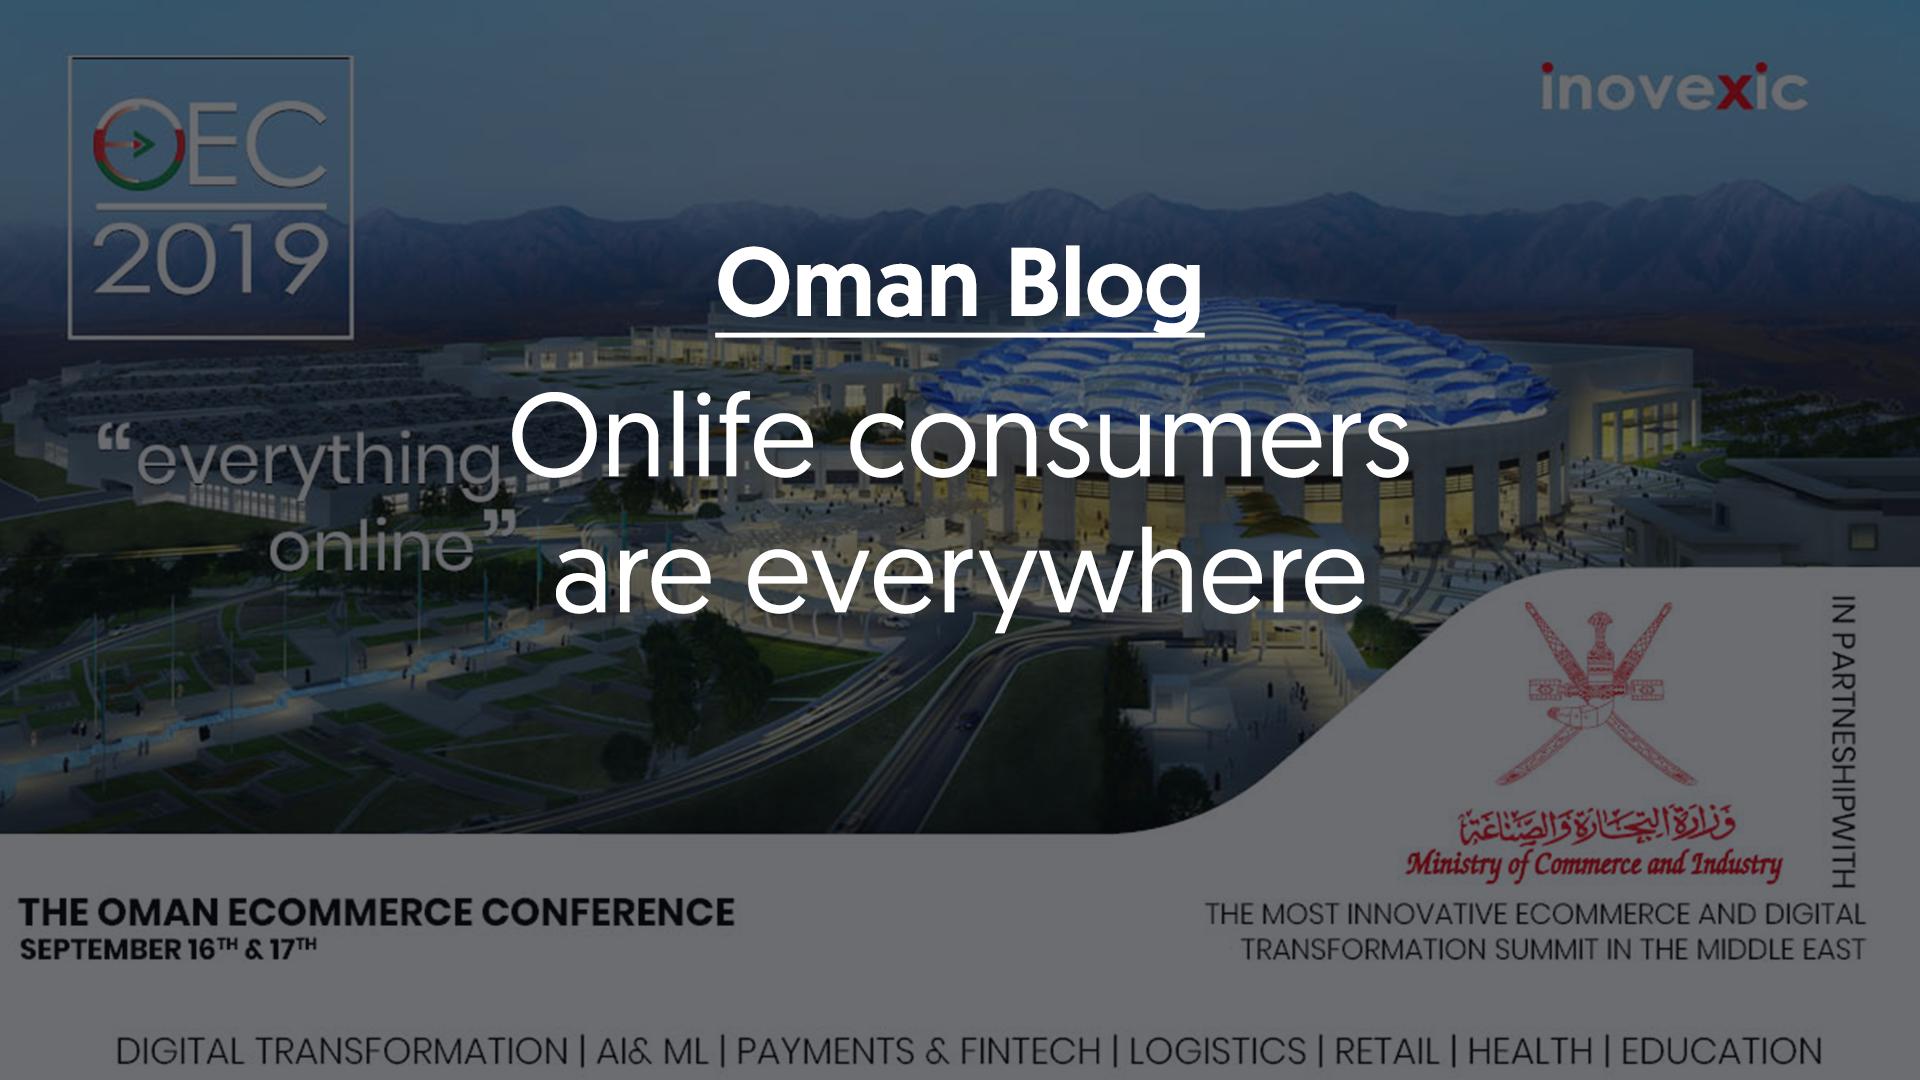 Onlife consumers Oman Blog